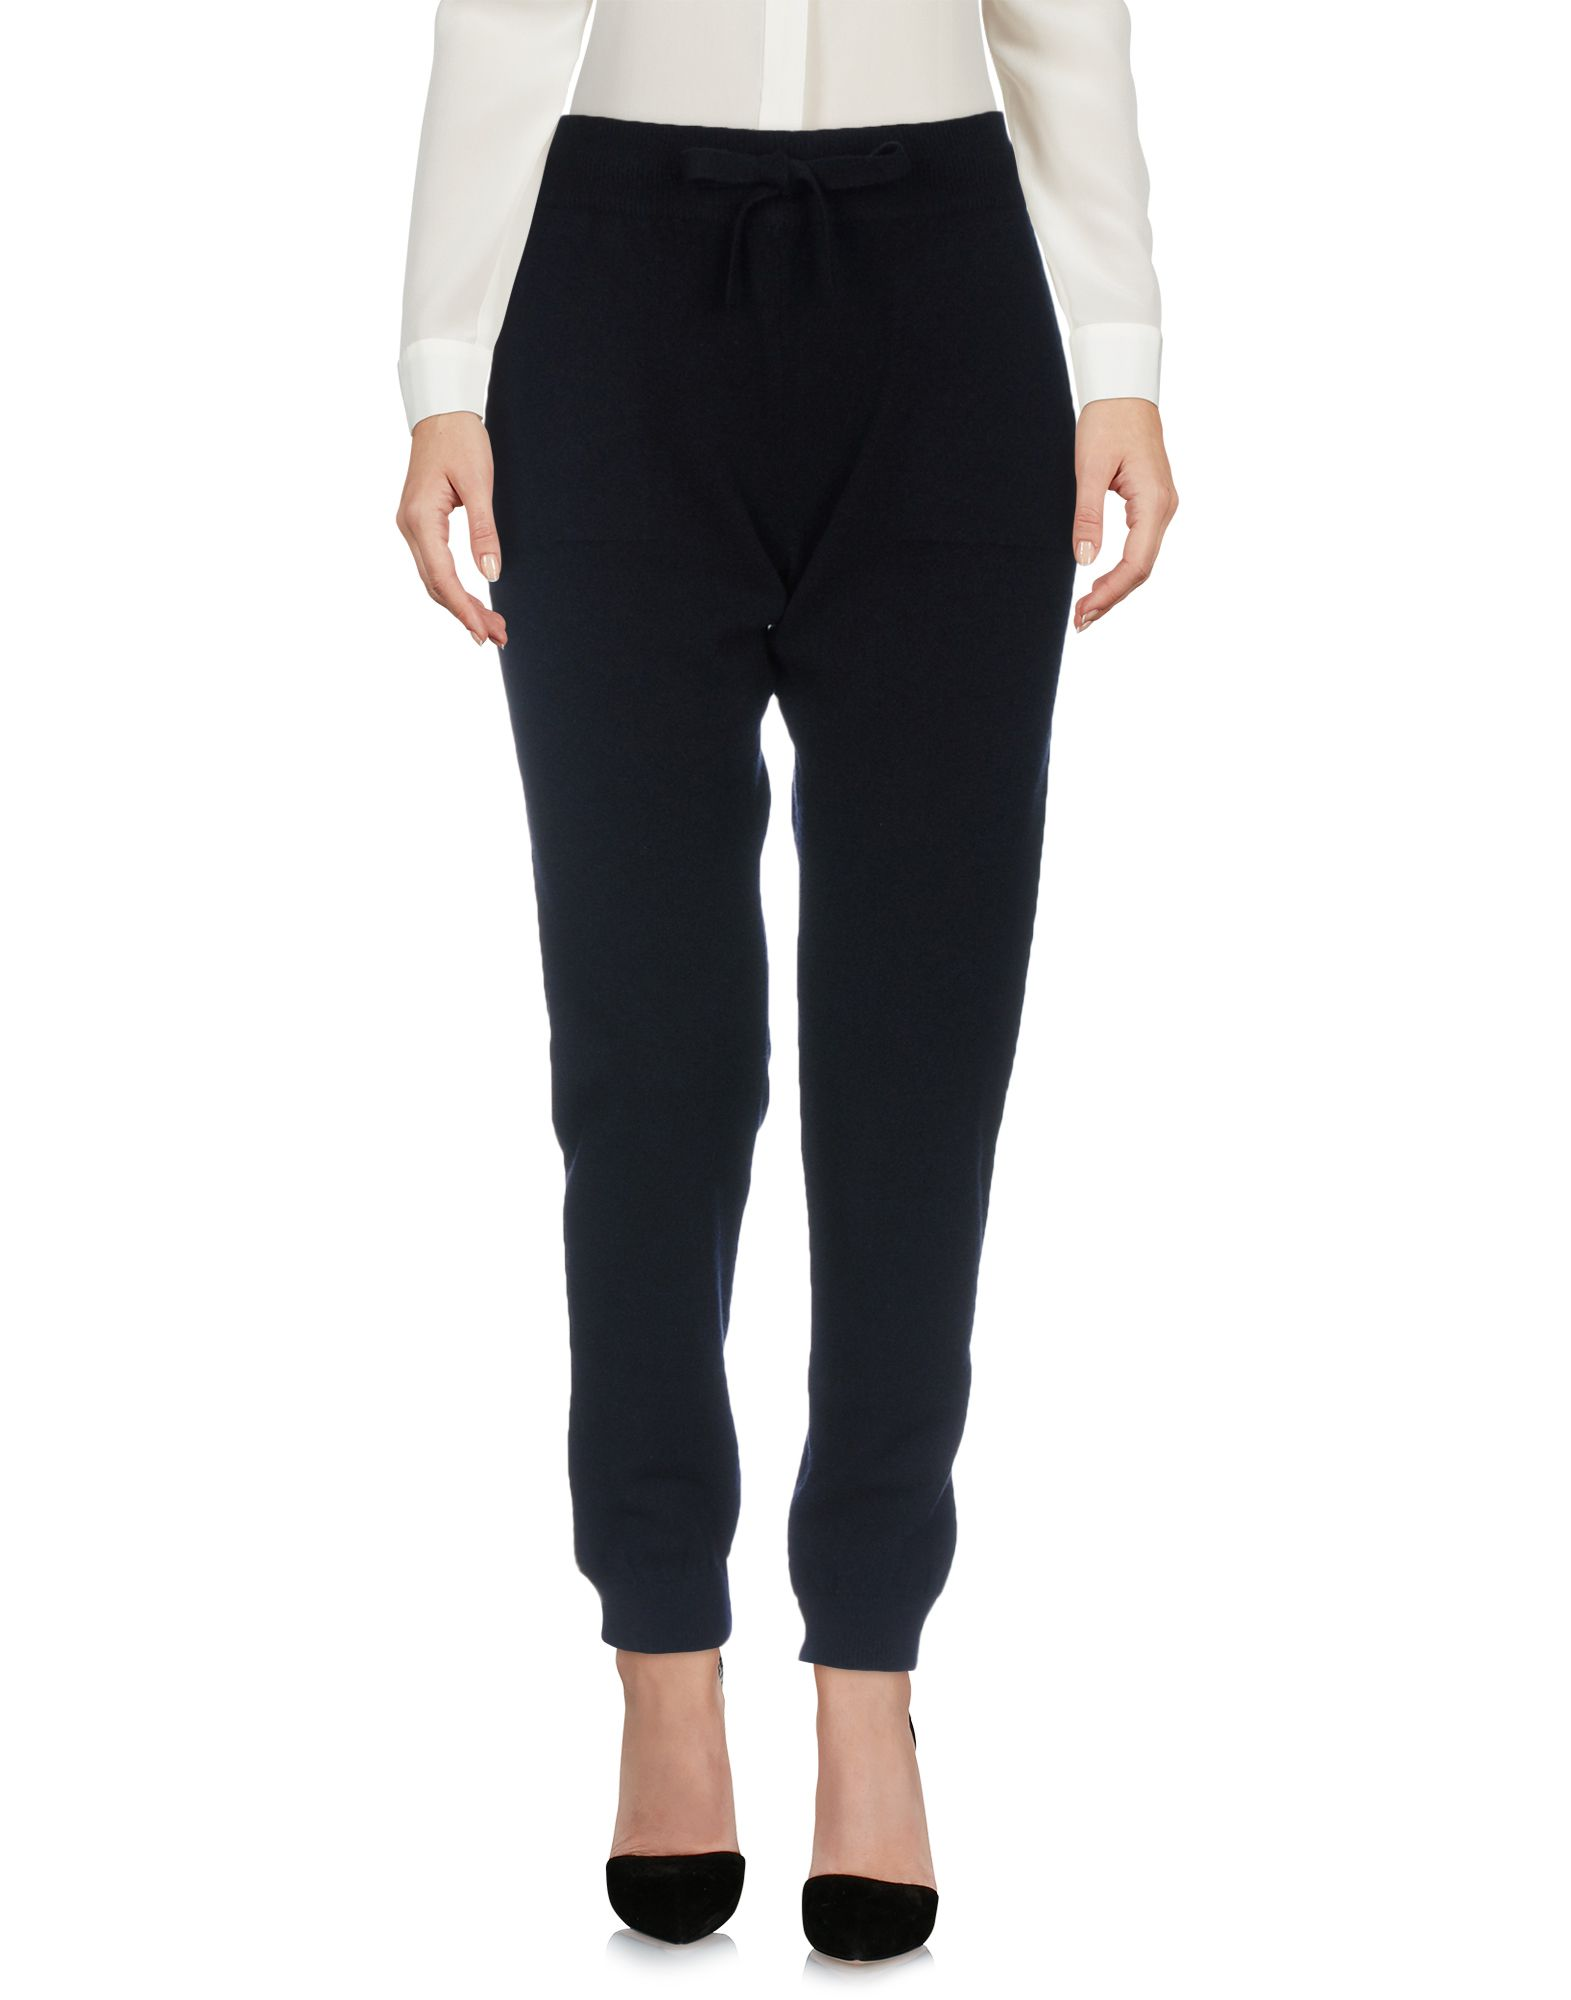 Pantalone Mrz Donna - Acquista online su obXCIjw